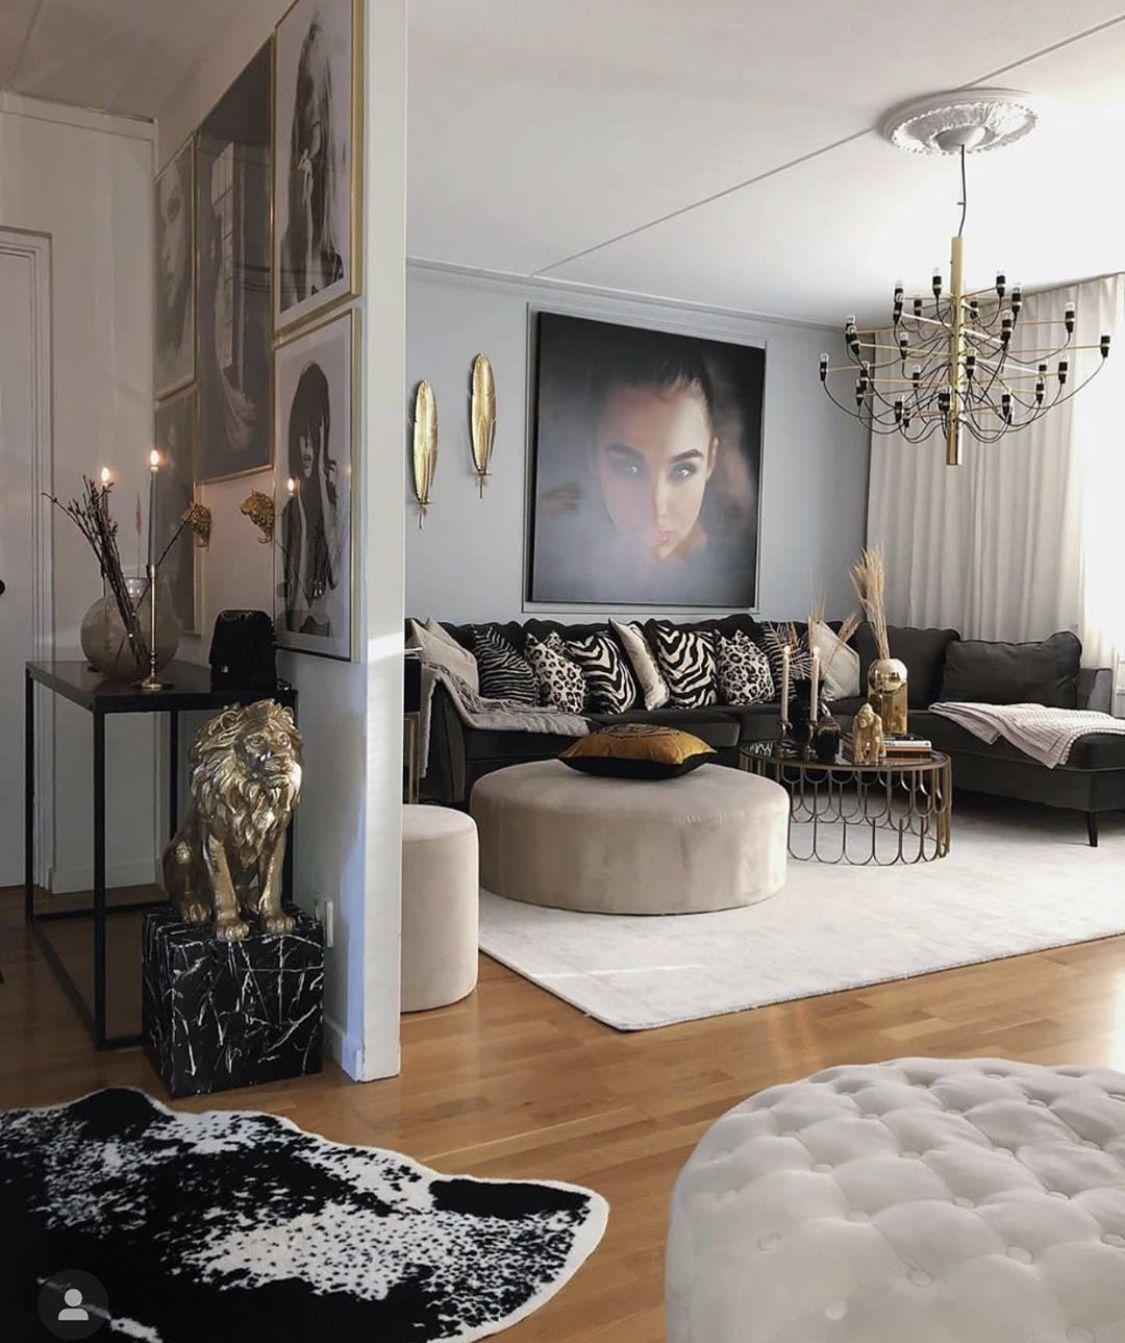 Pin By Fajer M On Decore & Interior